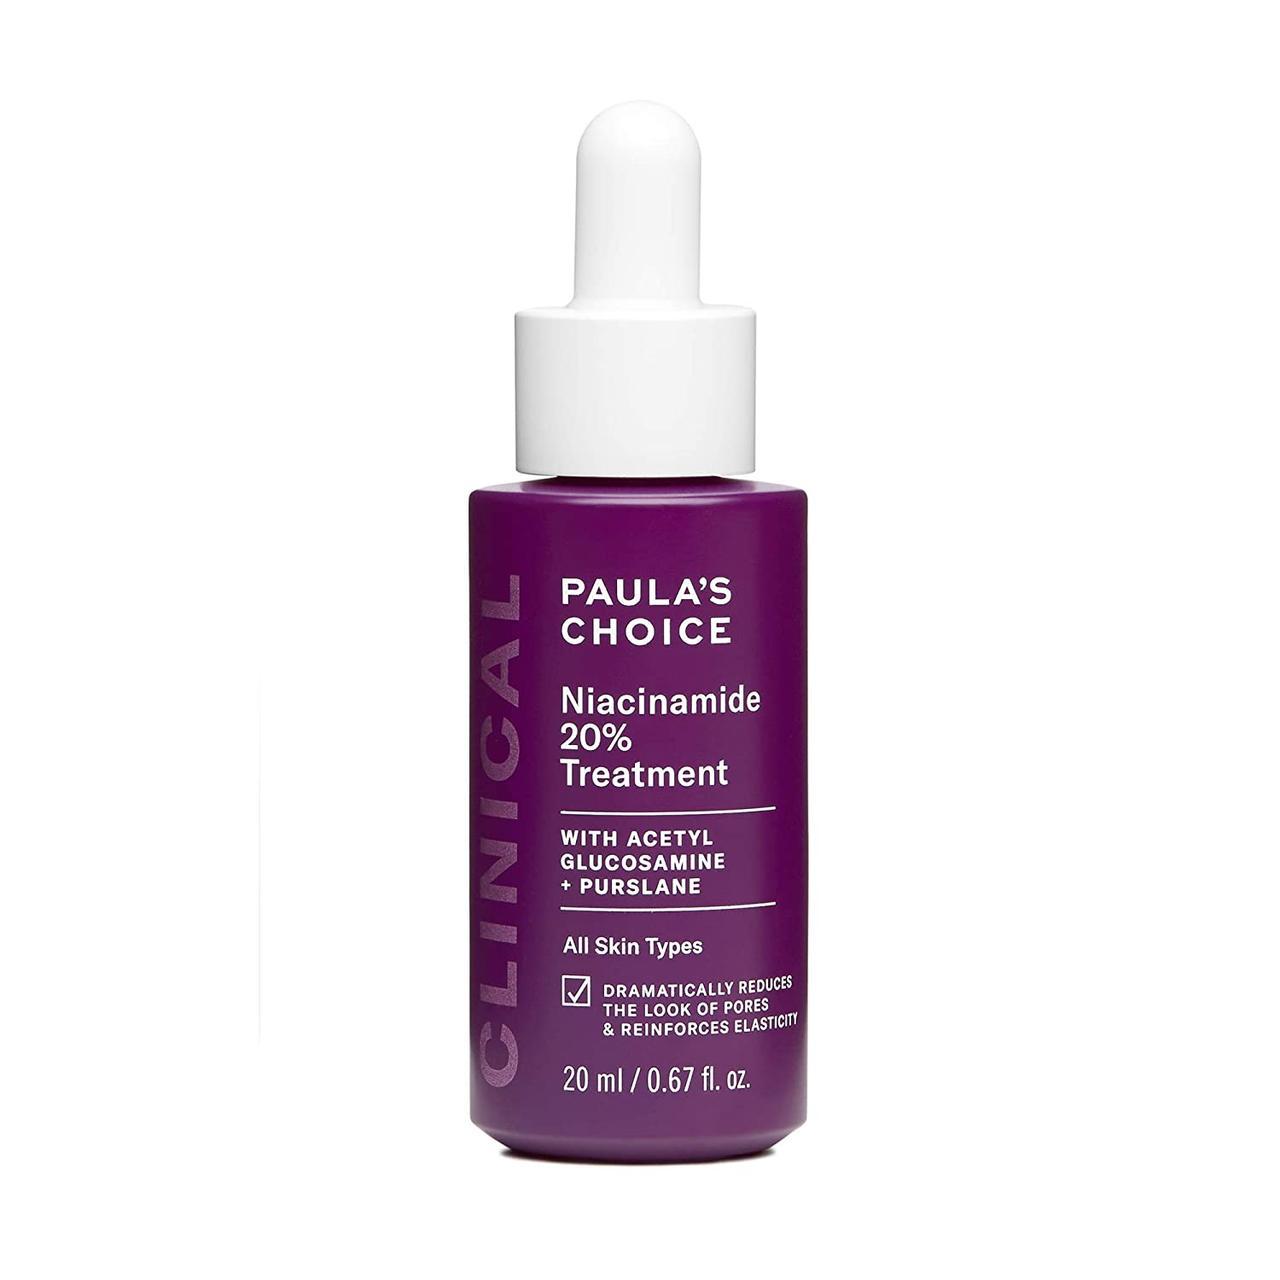 Сыворотка Paula's Choice 20% Niacinamide Treatment